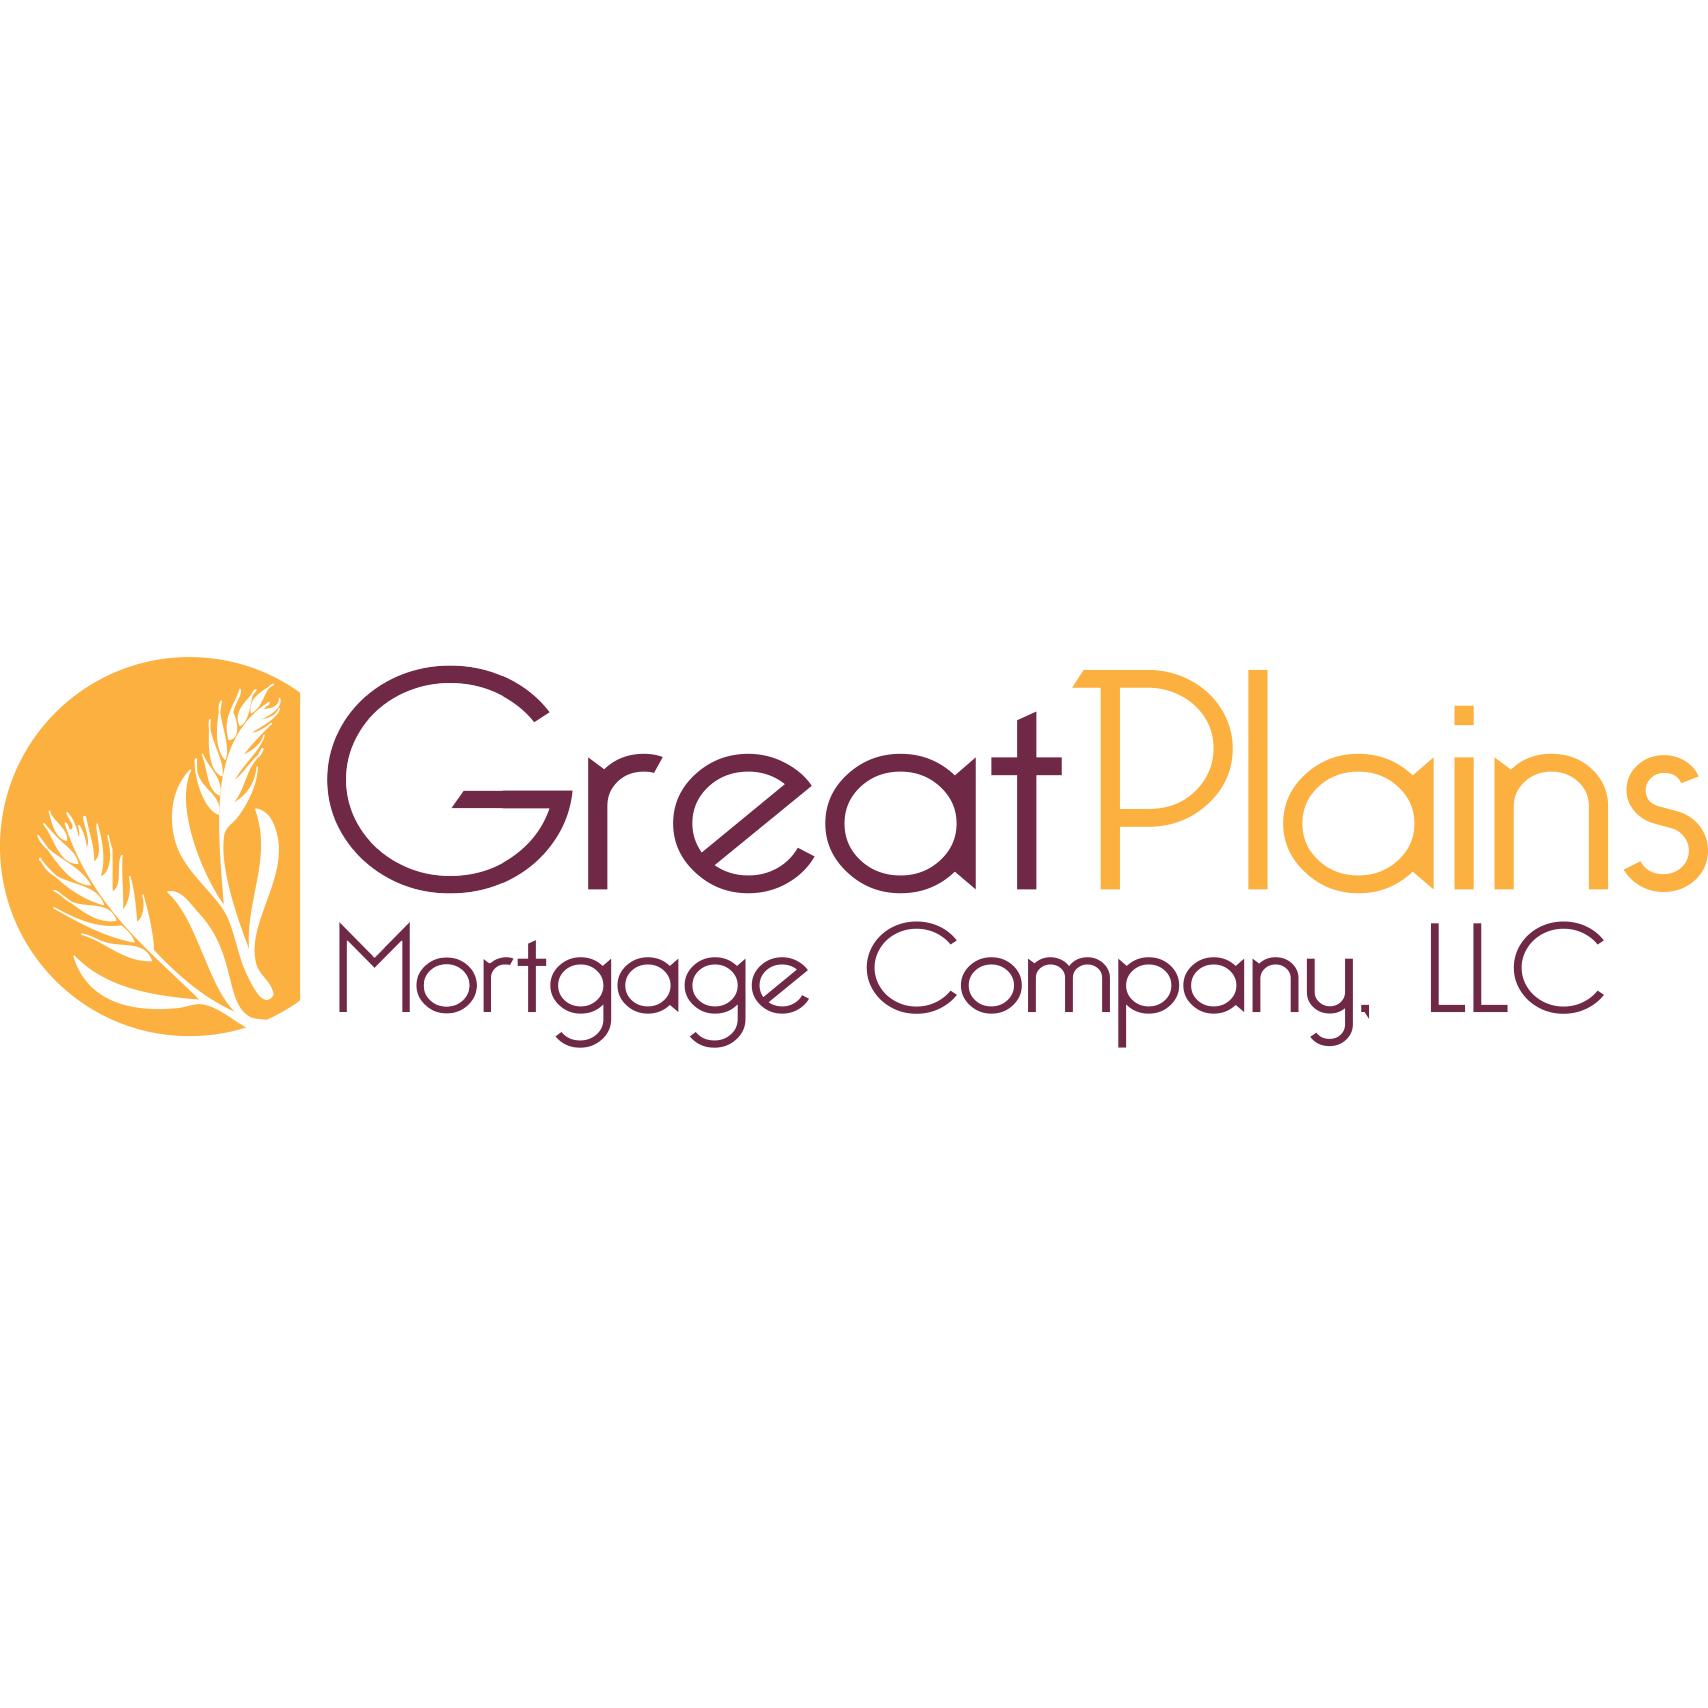 Great Plains Mortgage Company, LLC